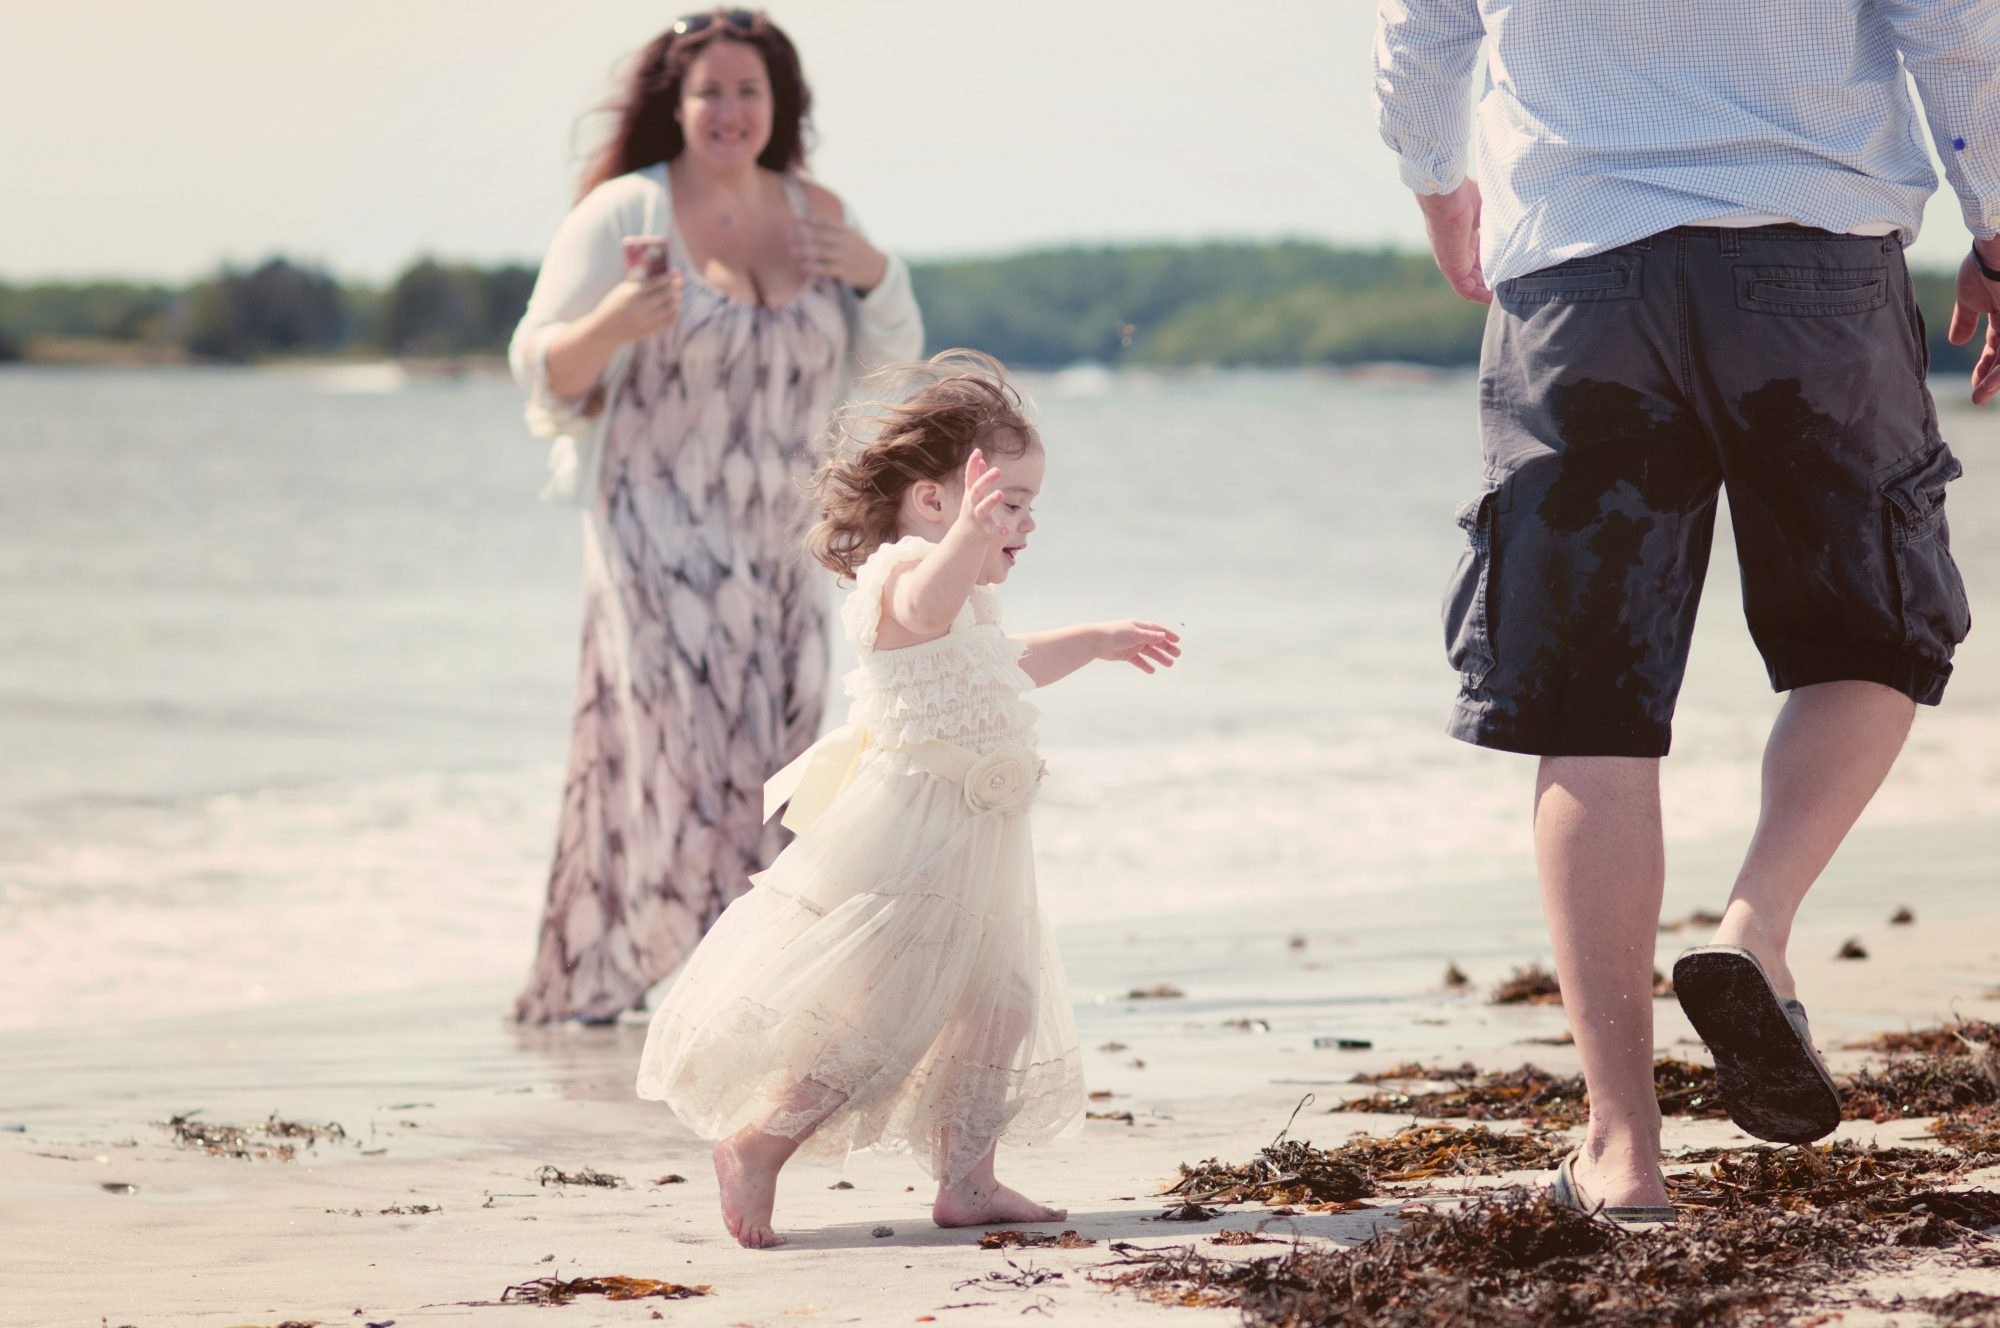 Little girl running at the beach in Pemaquid Maine